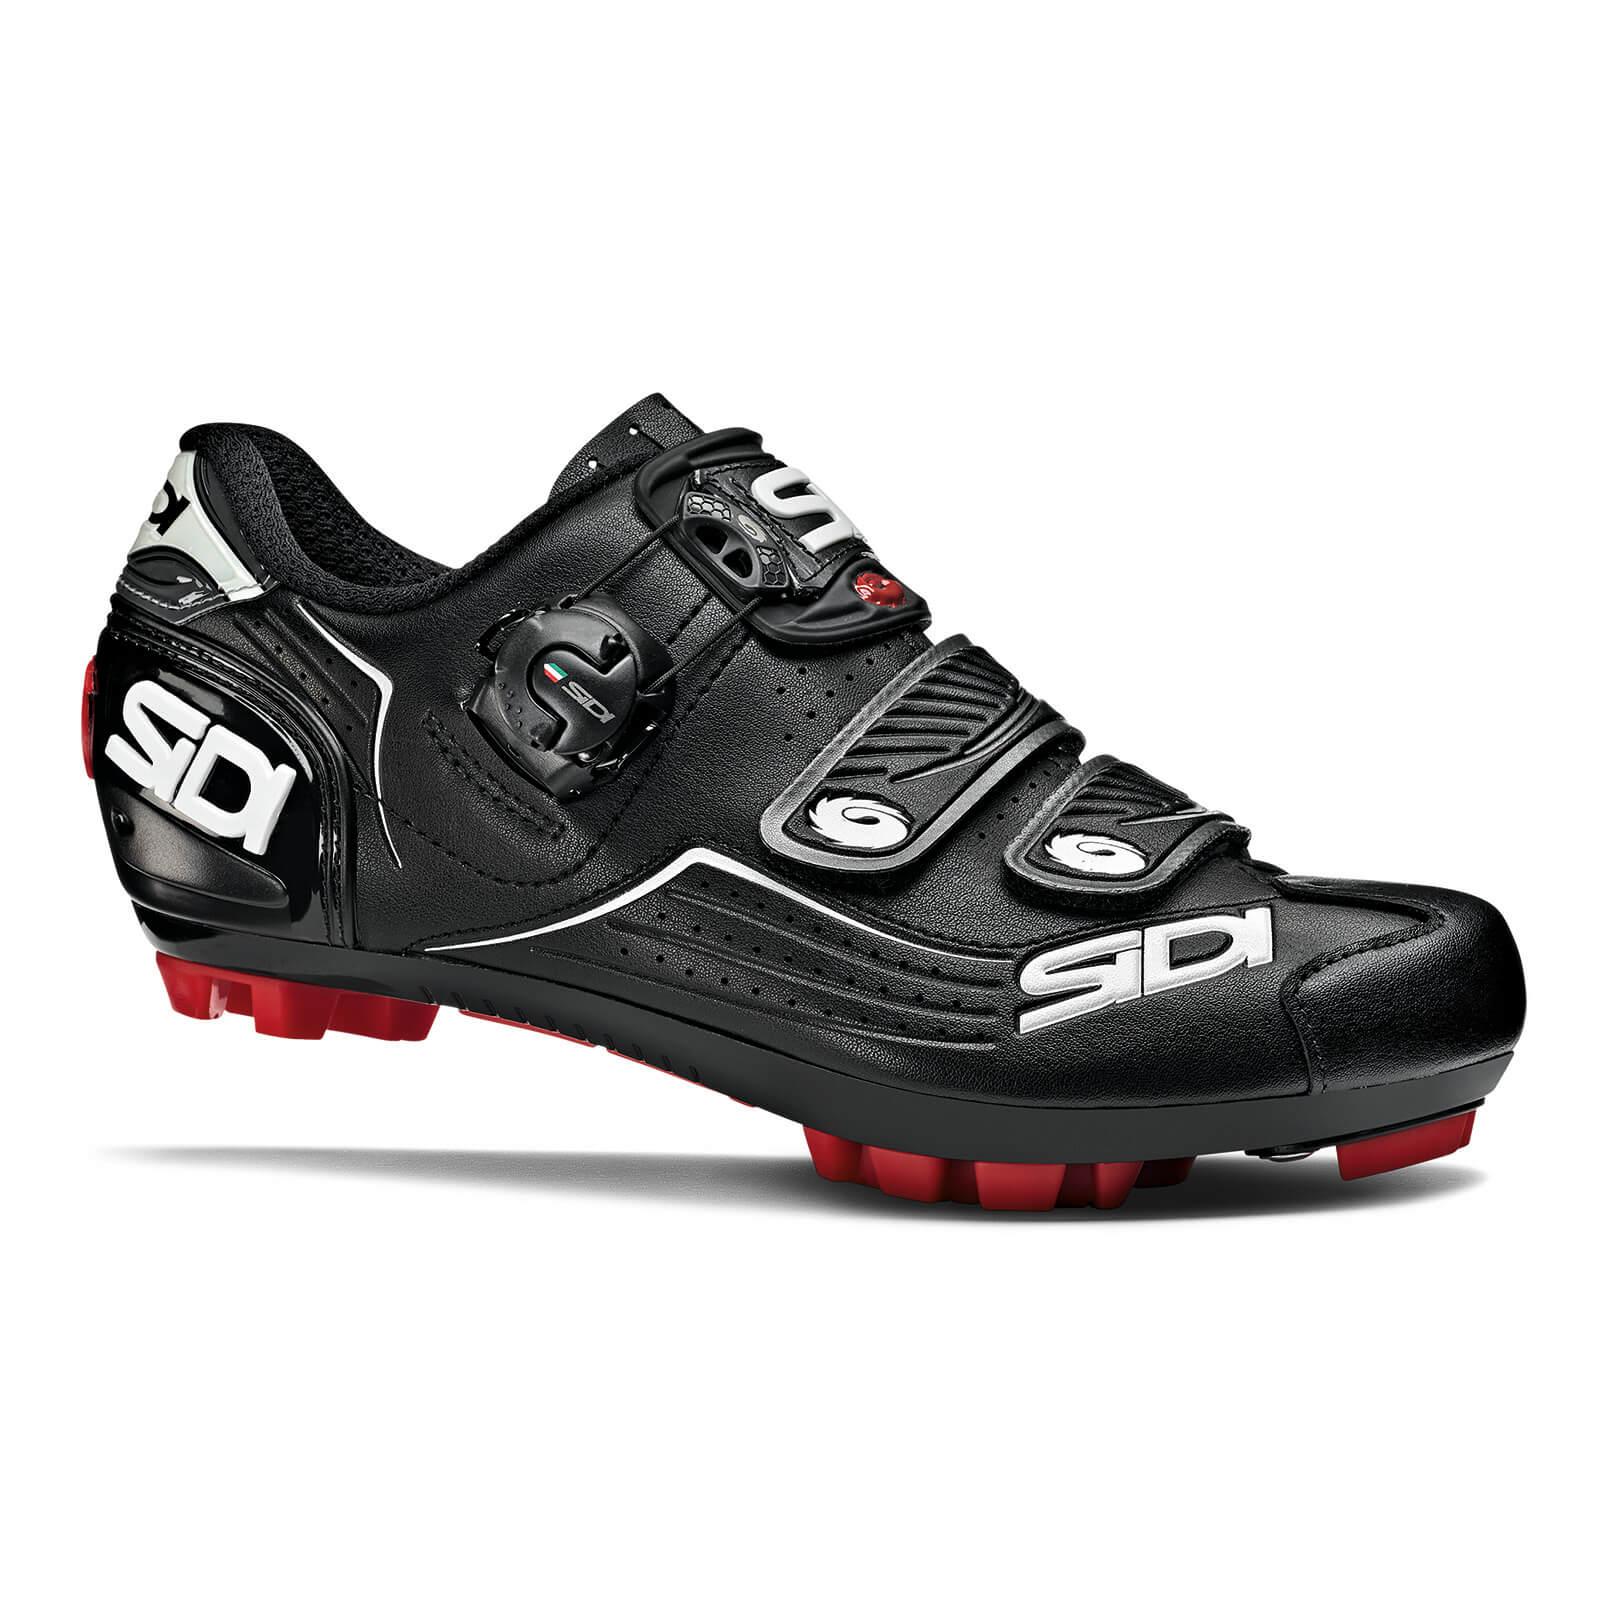 Sidi Women's Trace MTB Shoes - EU 40